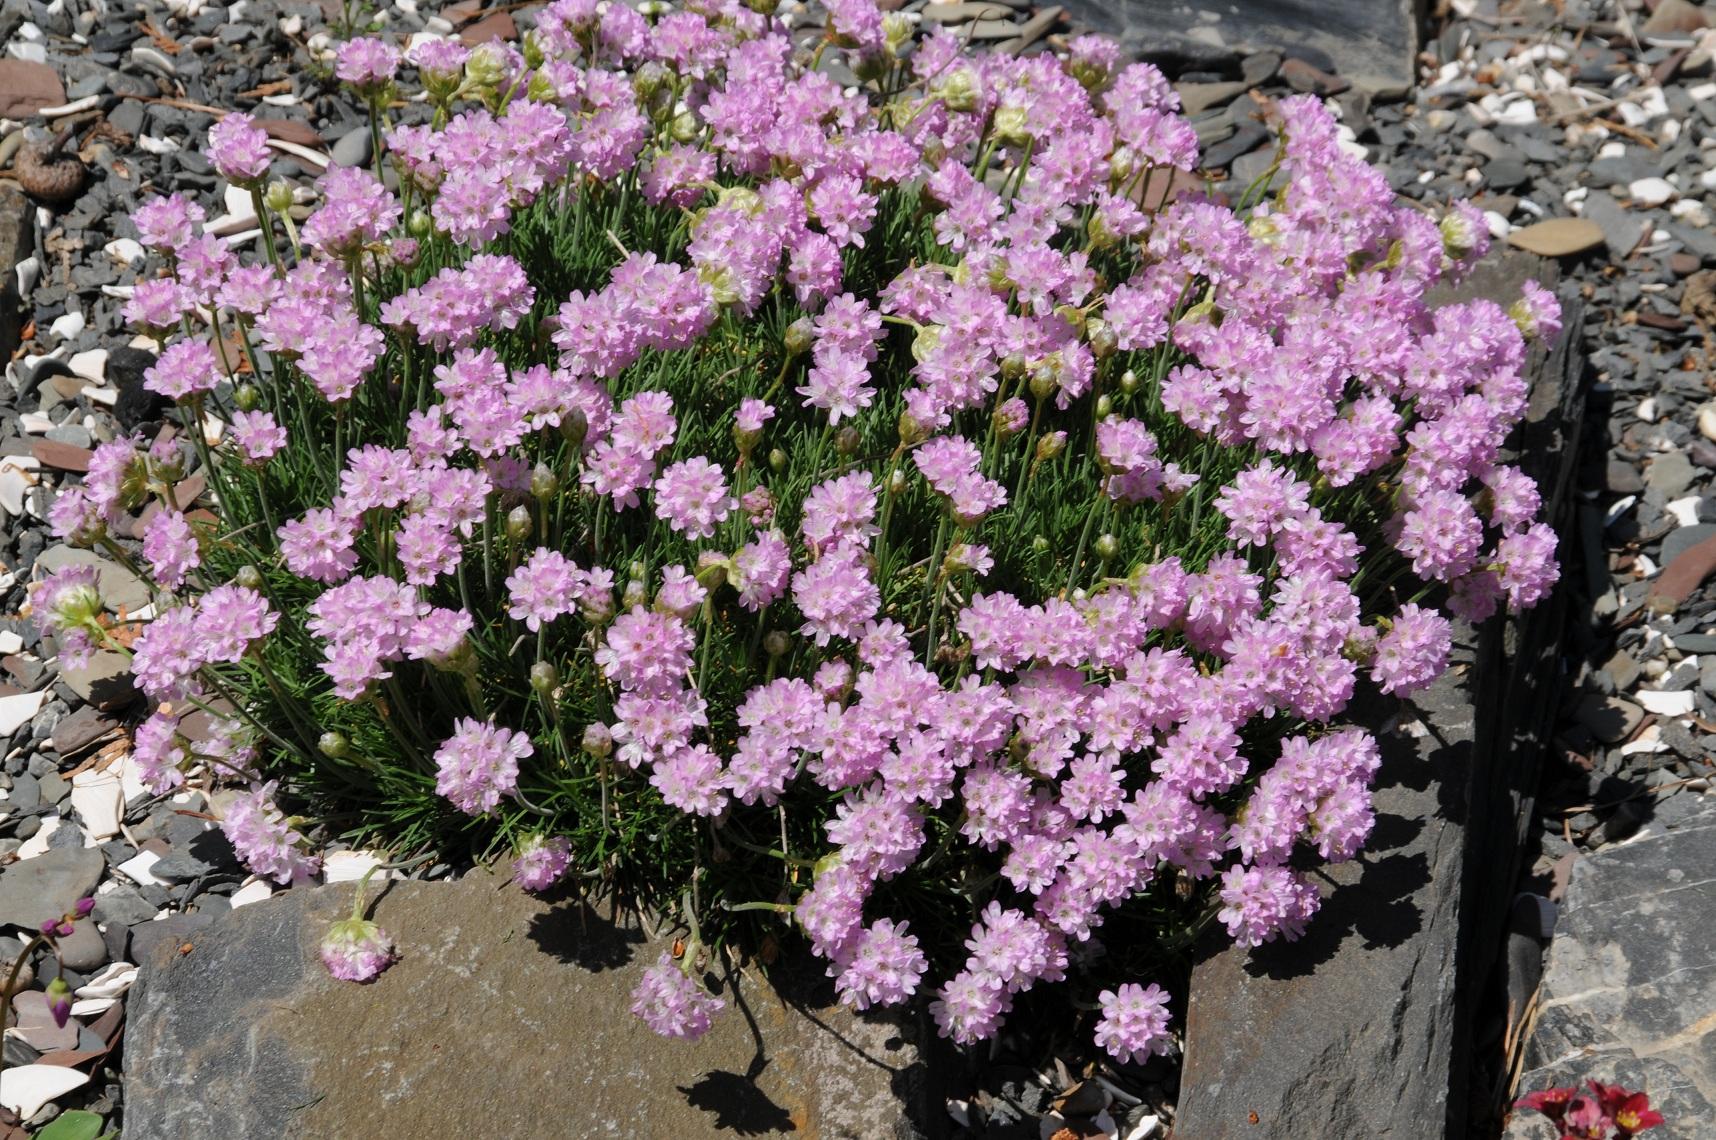 Armeria juniperifolia (Armérie à feuille de genévrier) 20120524-1 STA